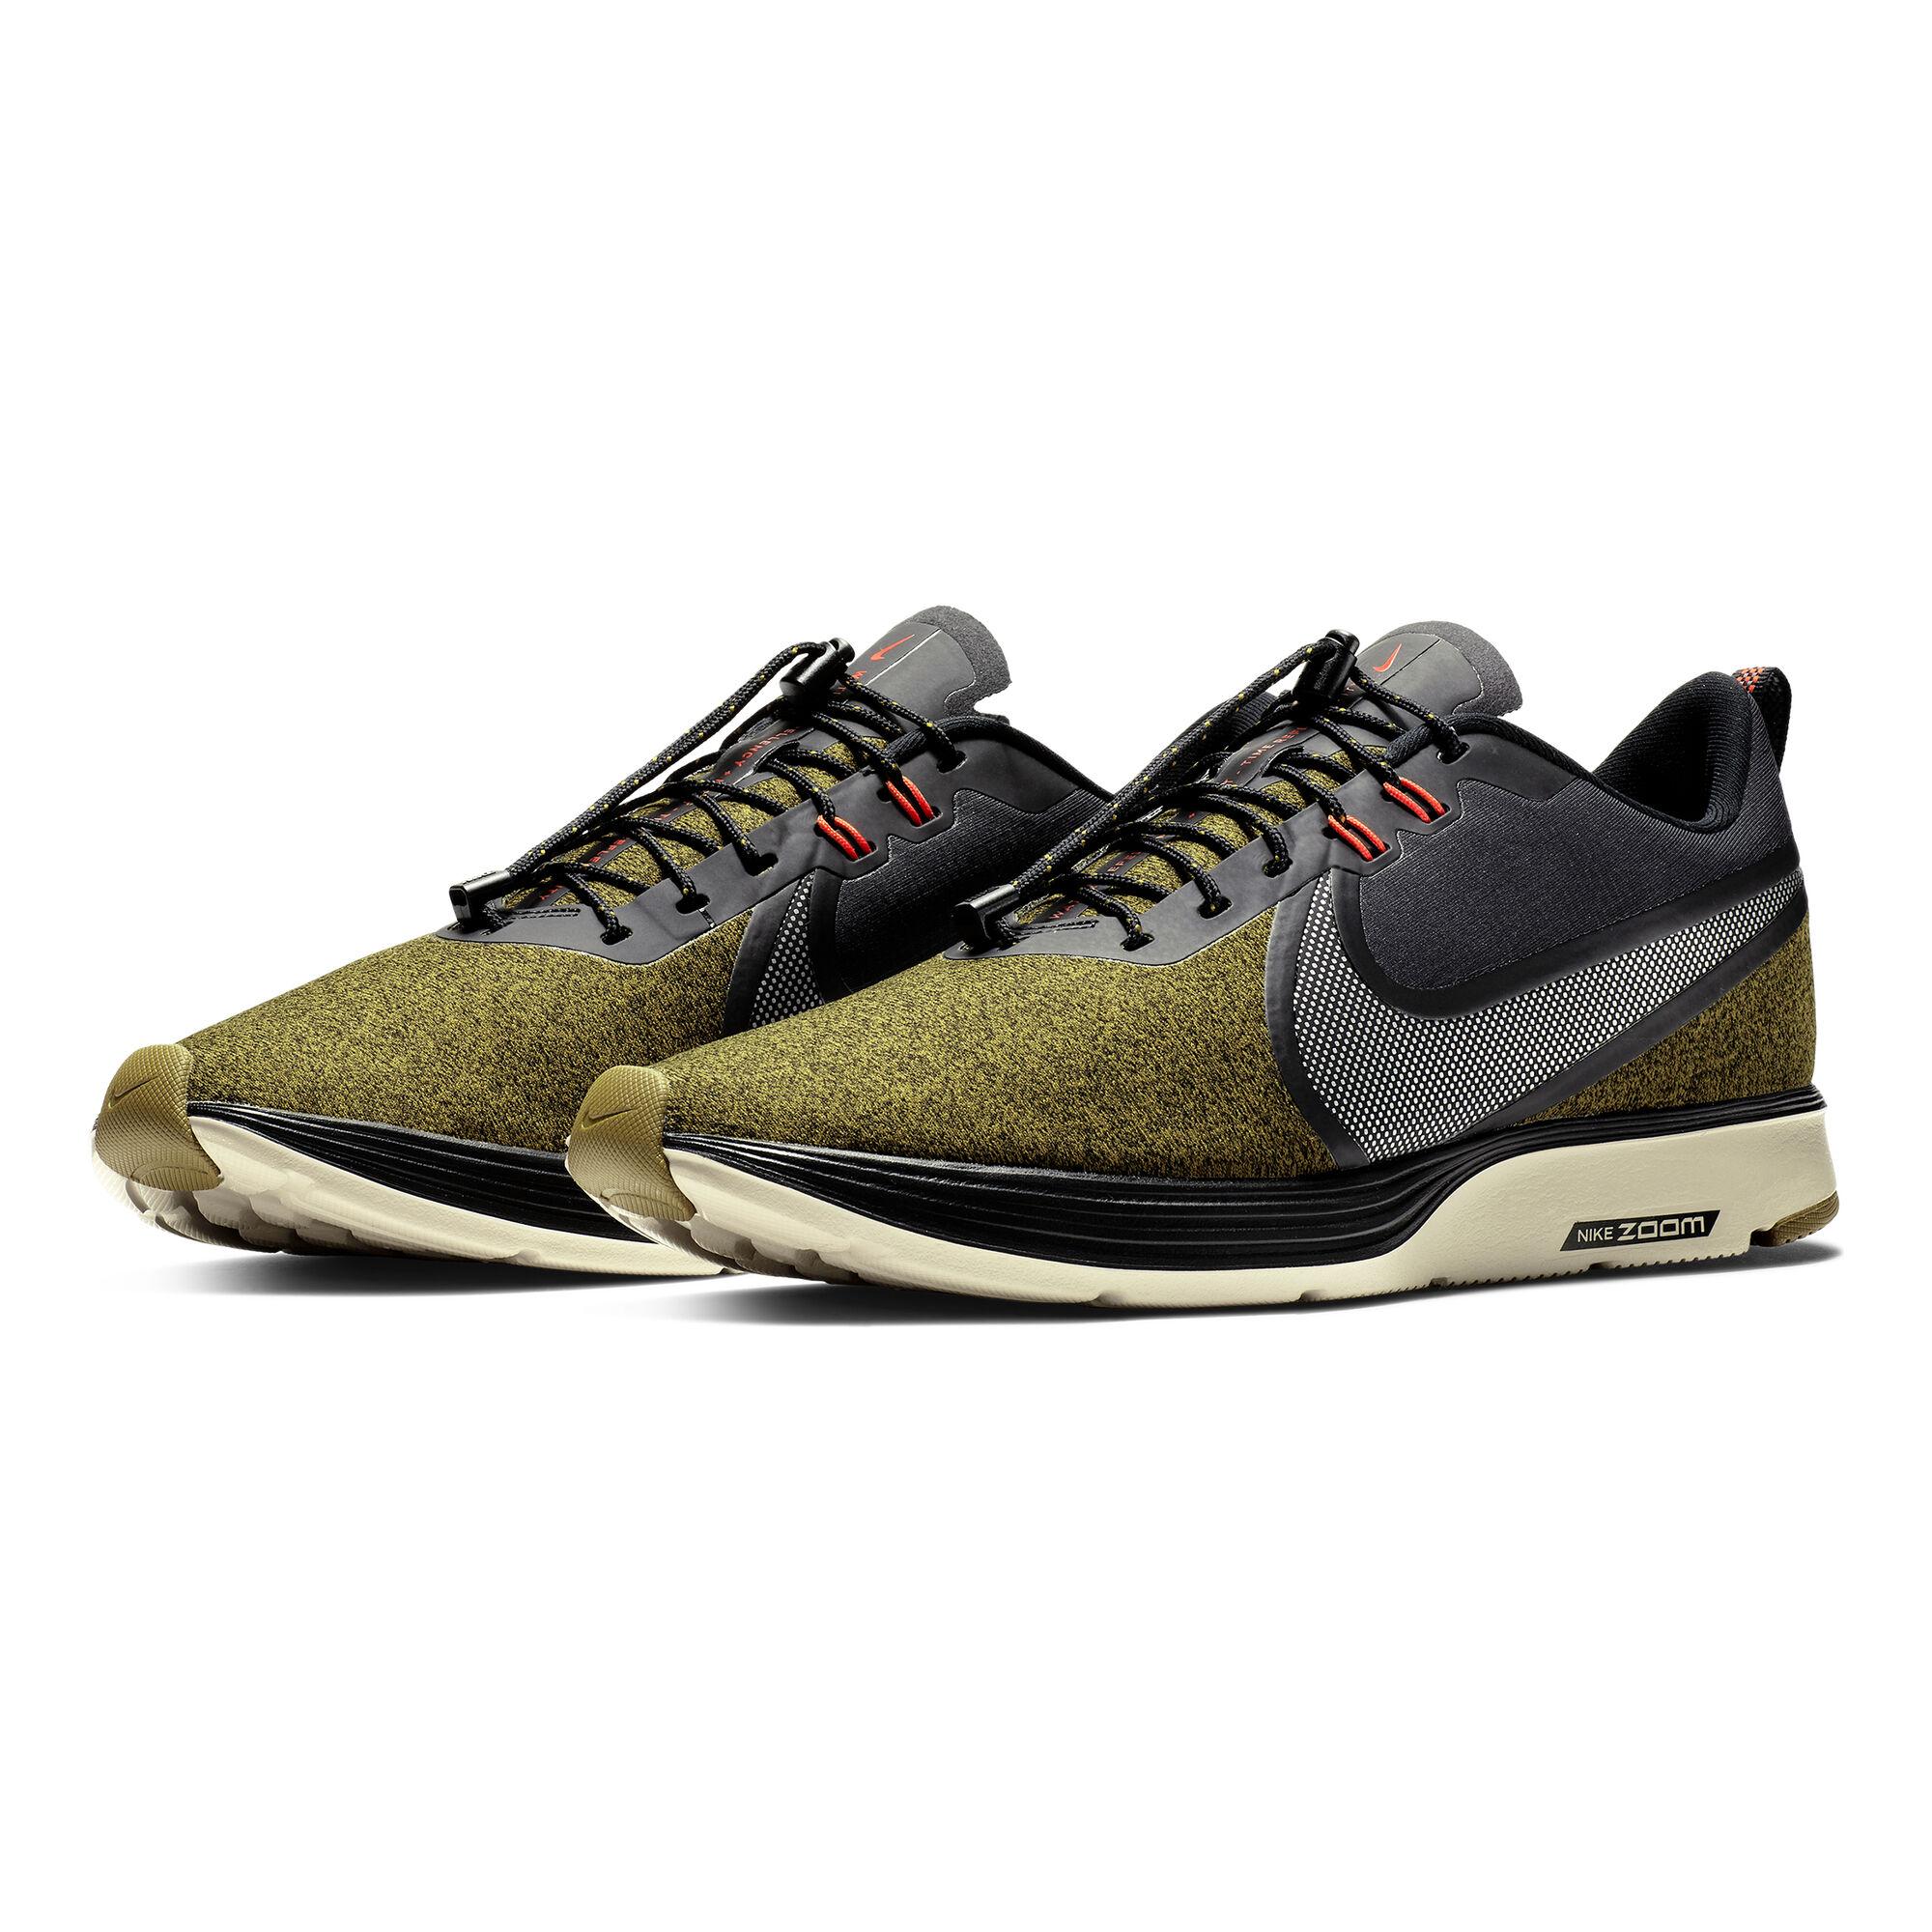 996e8d8c3dc9 buy Nike Zoom Strike 2 Shield Neutral Running Shoe Men - Olive ...